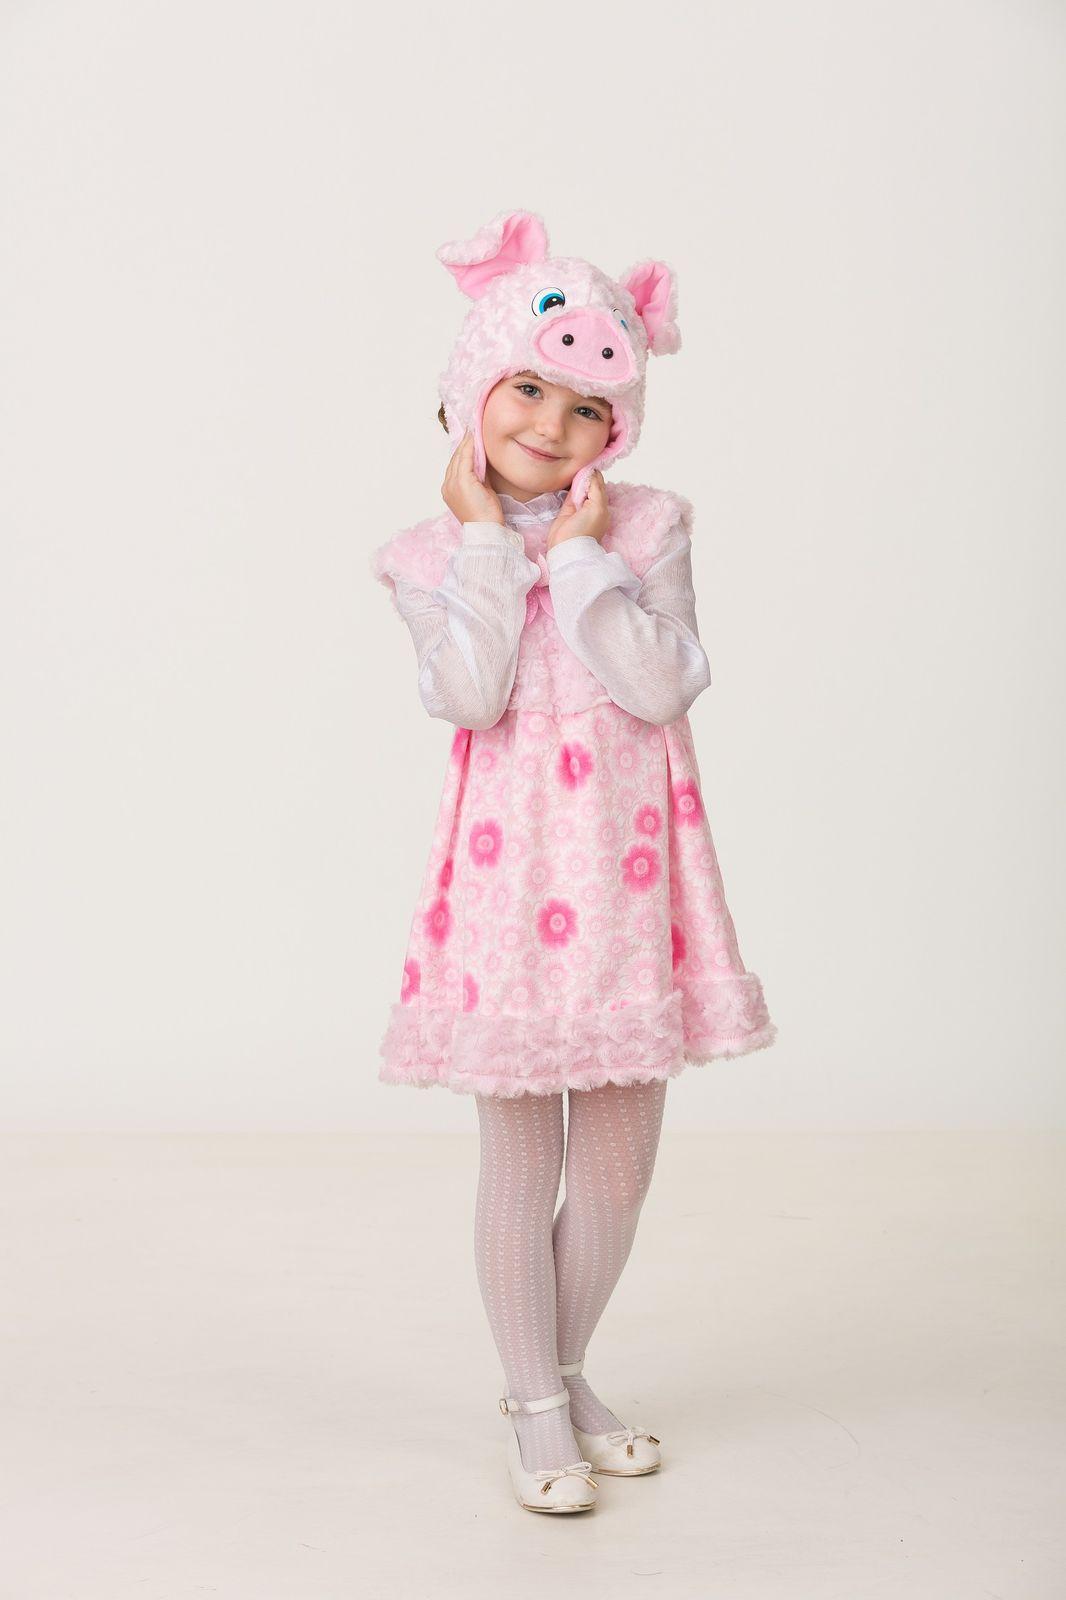 Карнавальный костюм Jeanees Свинка Бетта, цвет: розовый. Размер: 26 карнавальный костюм jeanees мышонок масик цвет серый размер 24